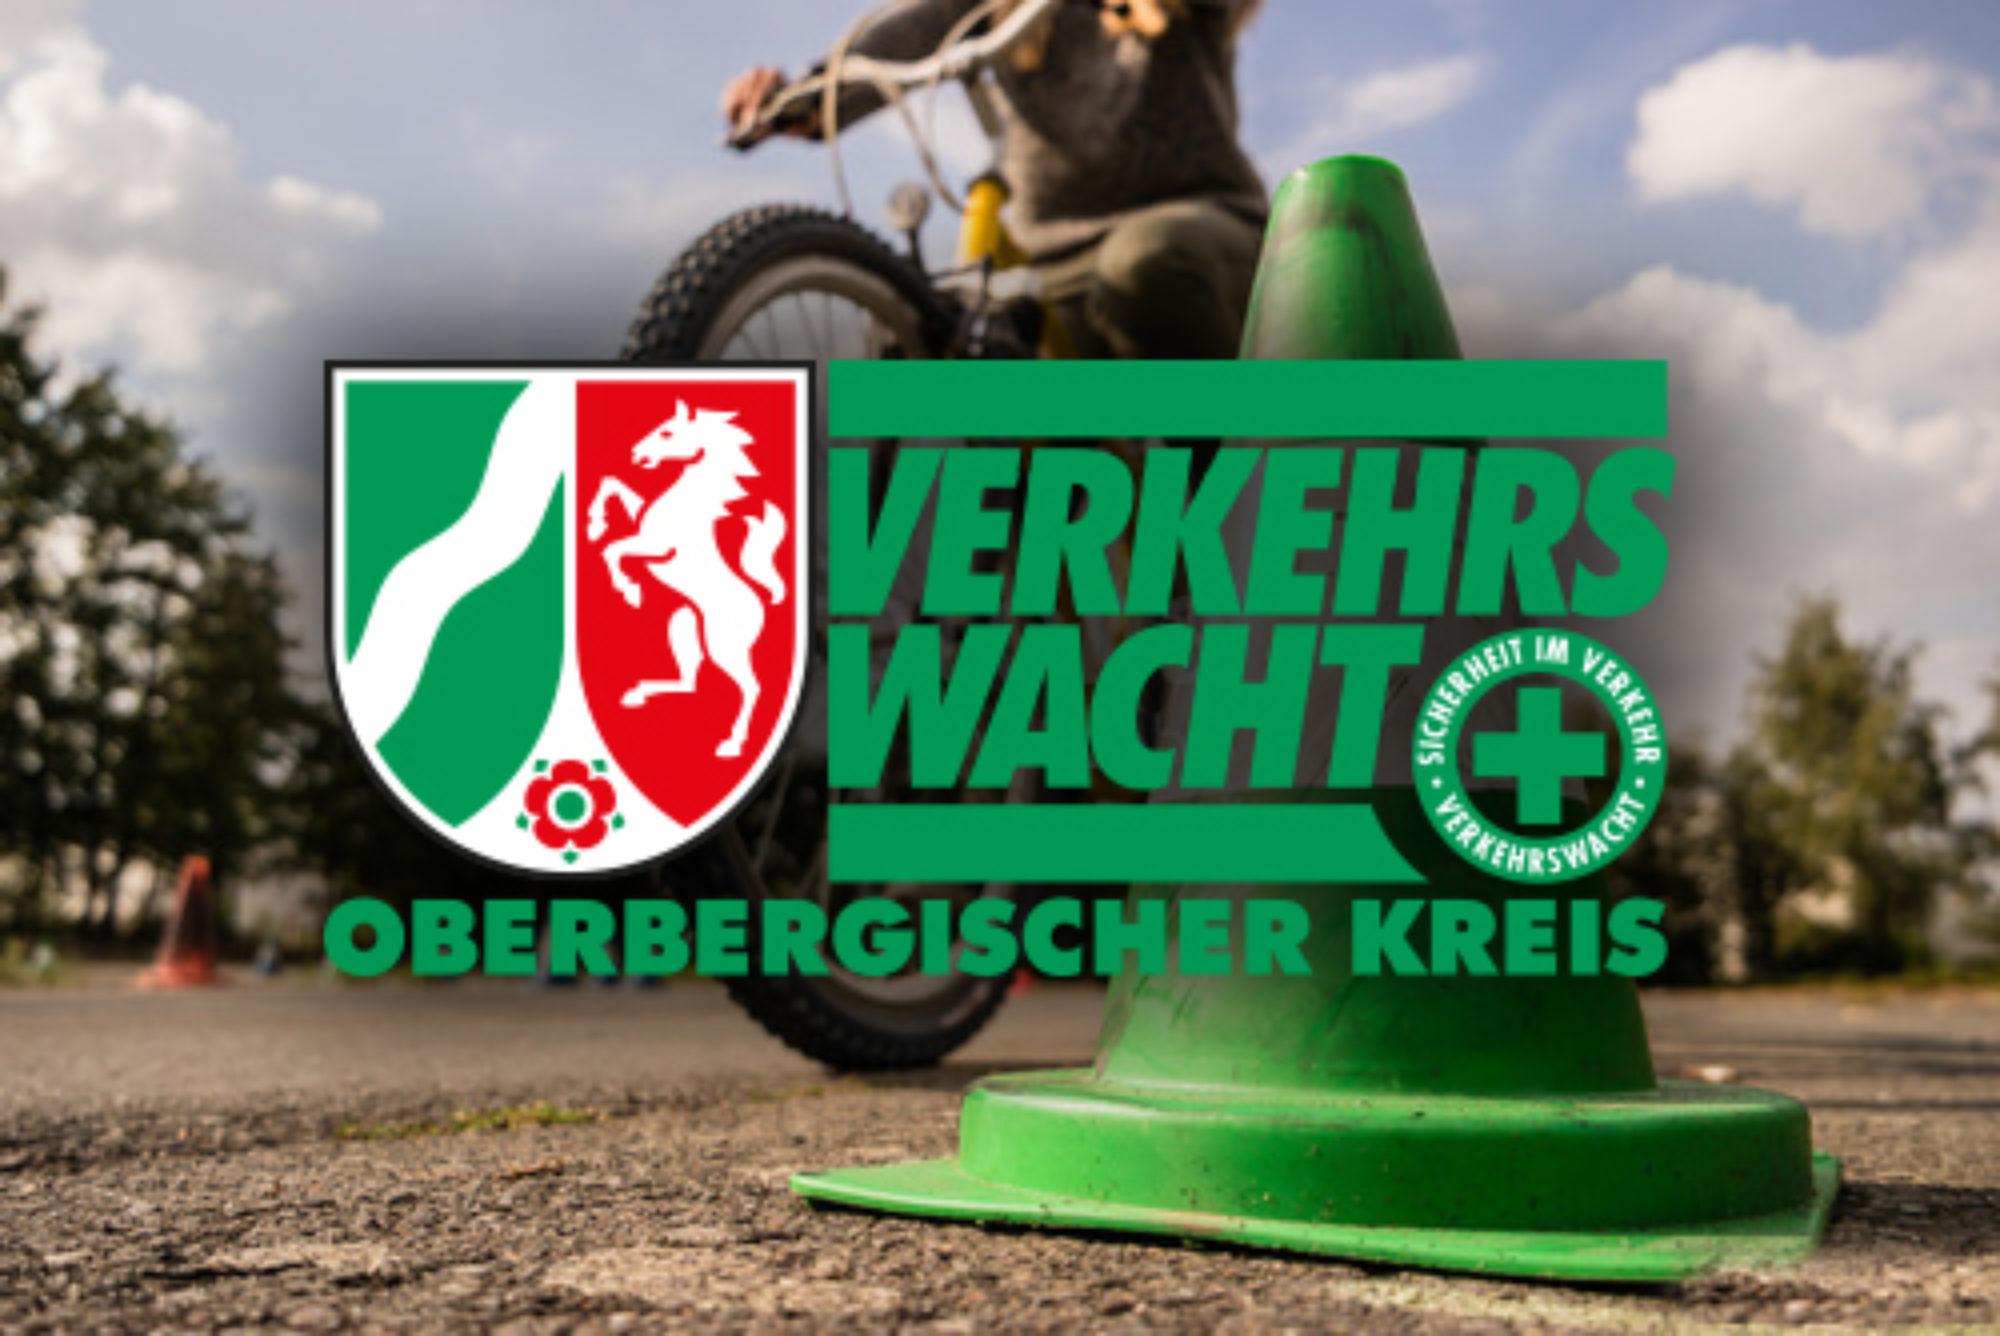 Verkehrswacht Oberberg